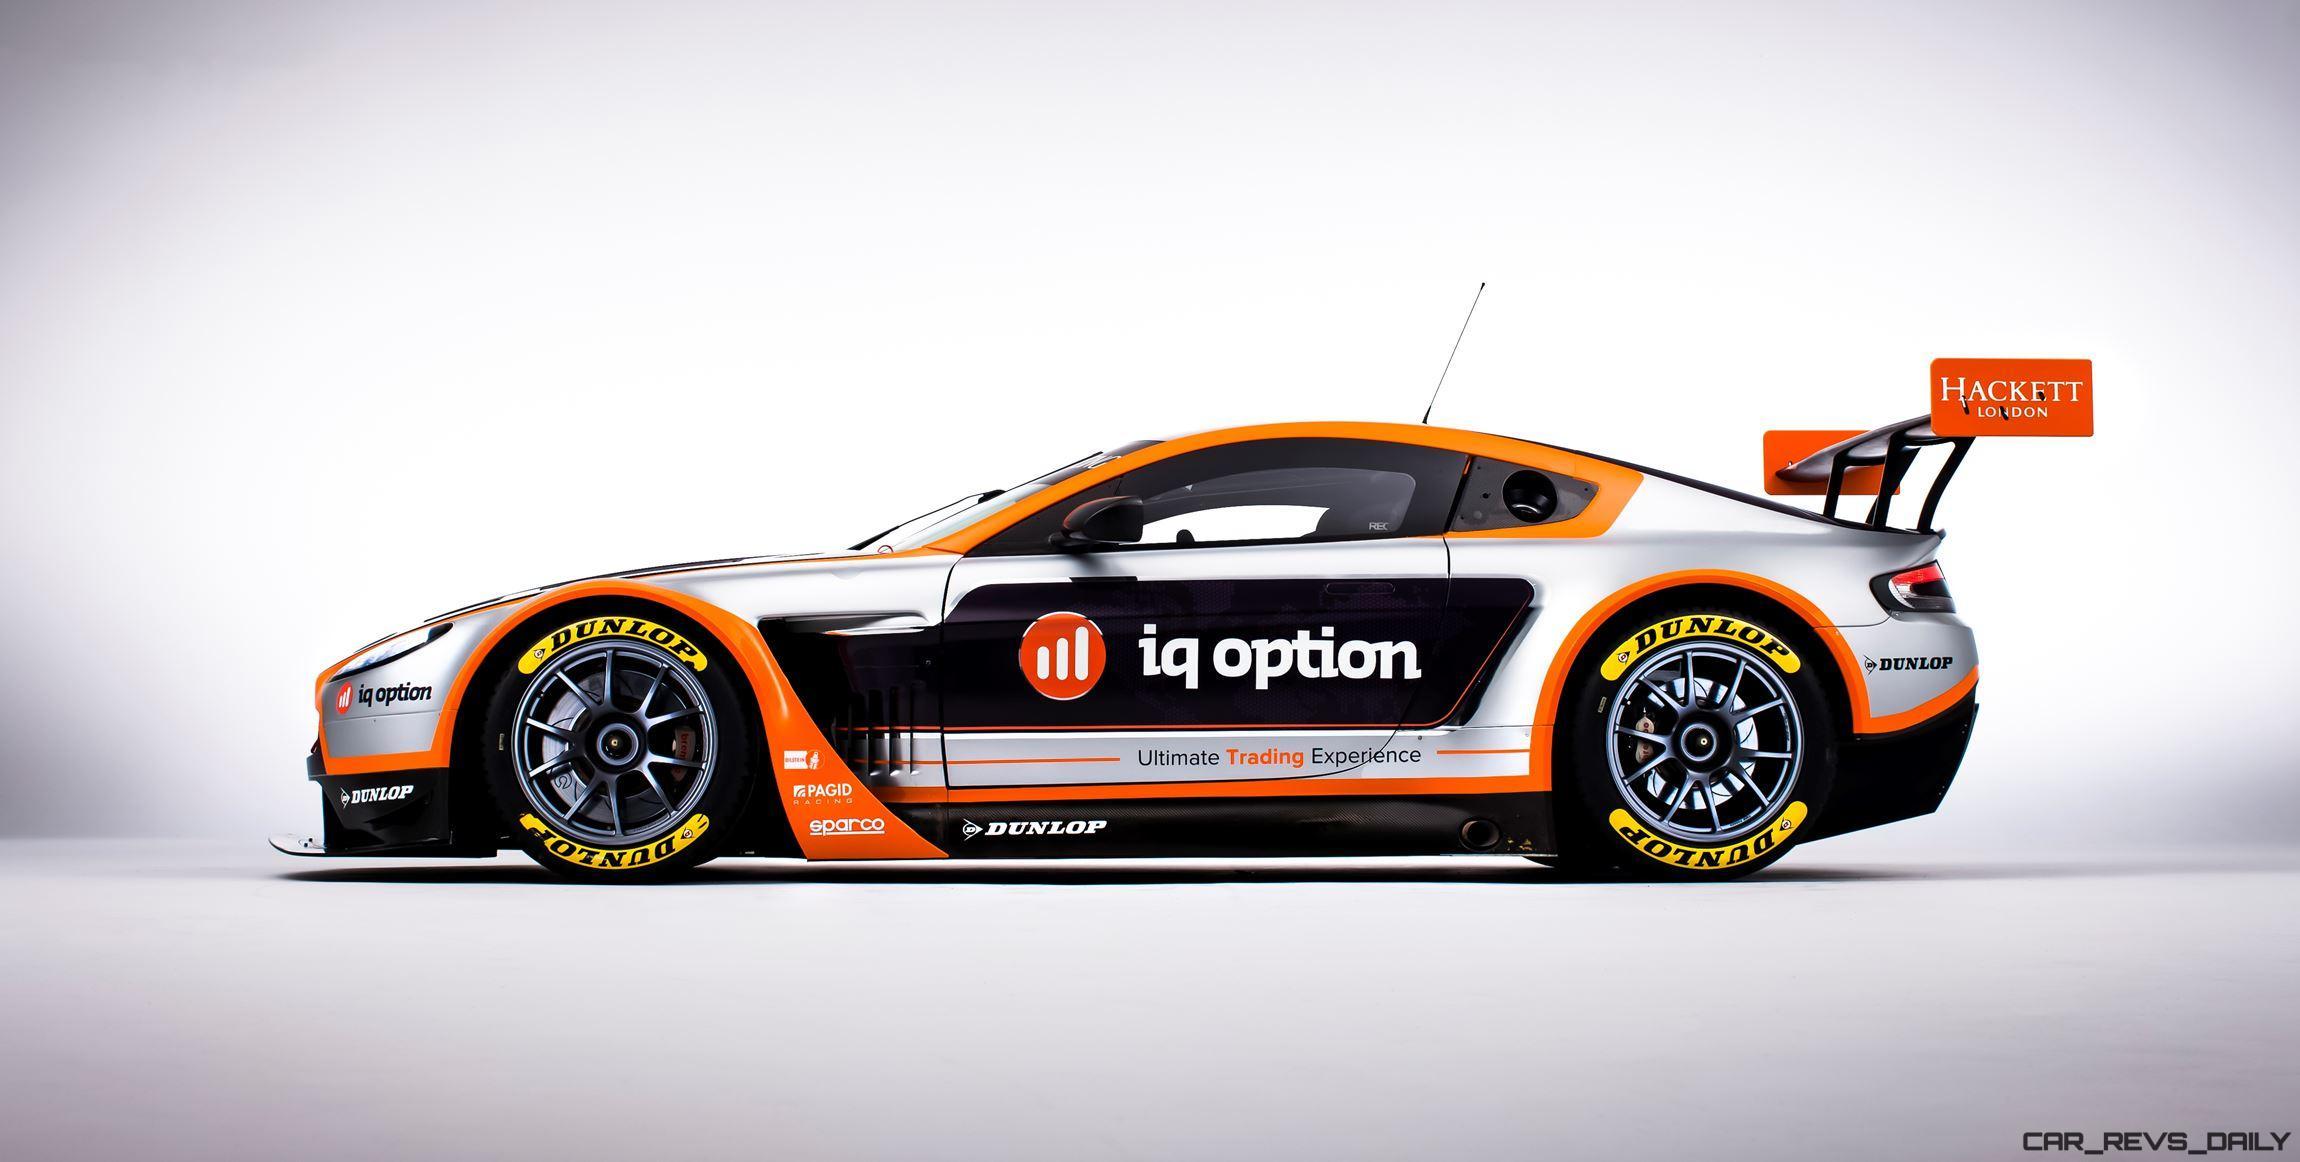 2016 aston martin v8 vantage gte complements v12 racecars; dismal